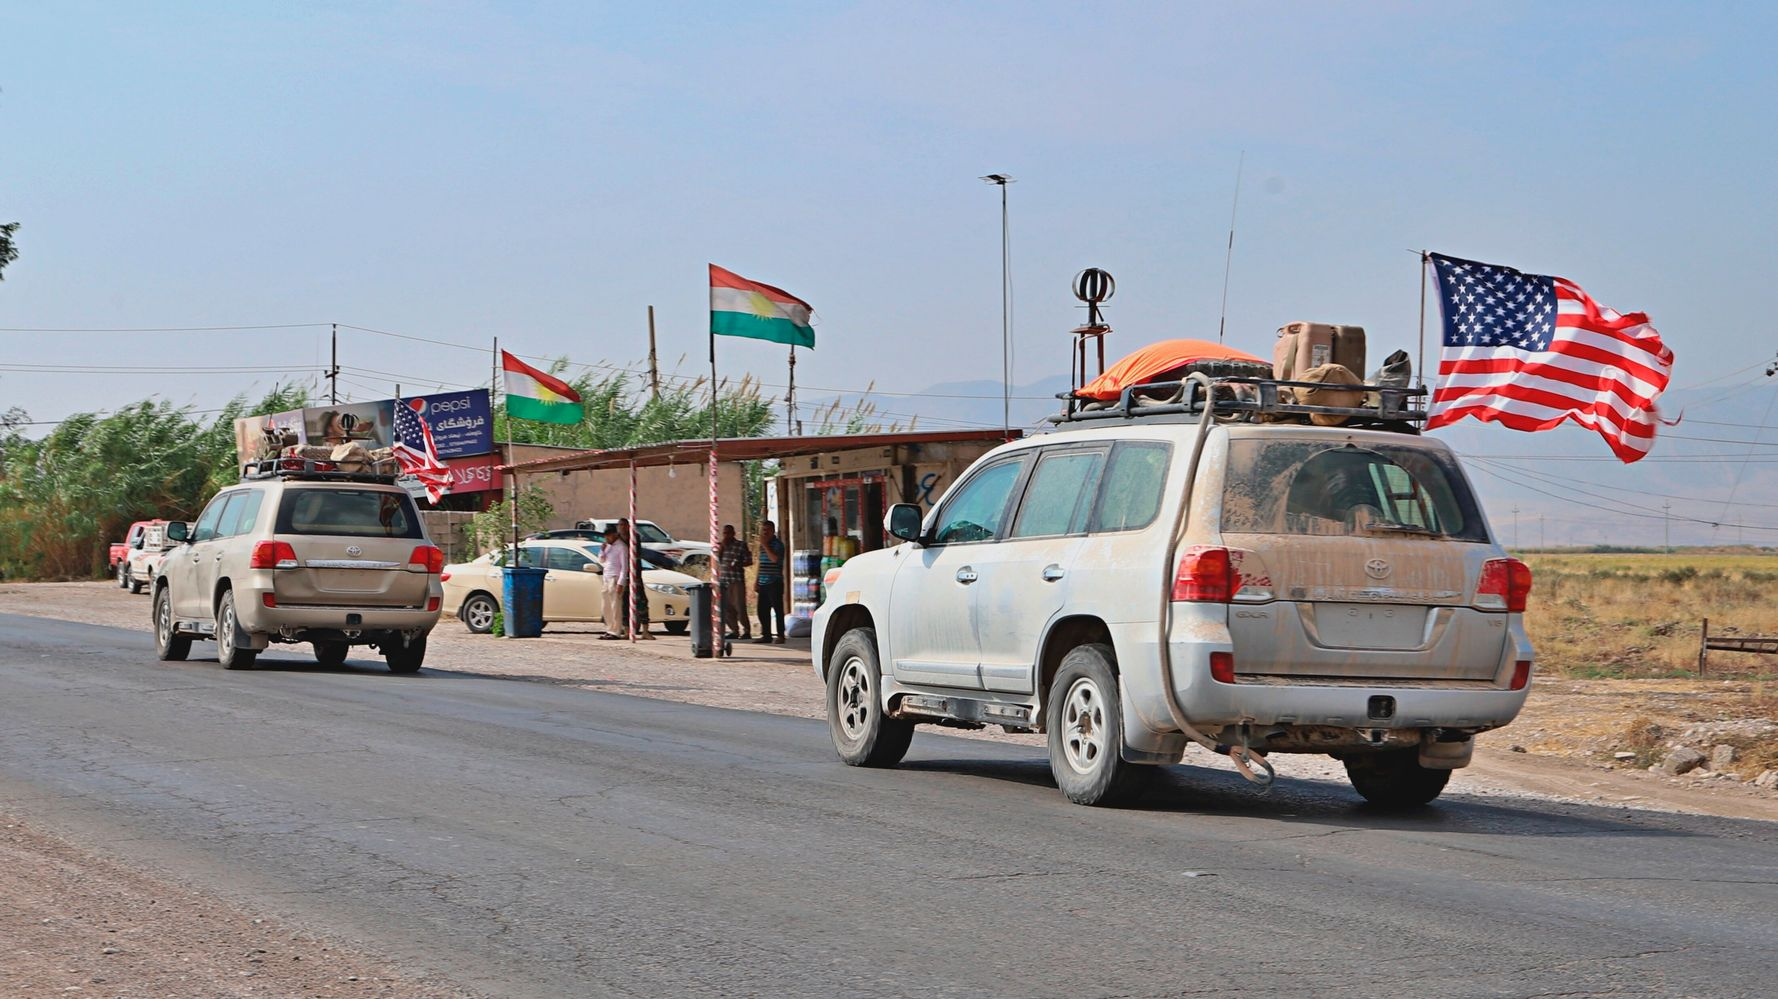 Westlake Legal Group 5e1395352500003b1998ff37 U.S. Military Says It Will Exit Iraq Following Iraqi Parliament Vote